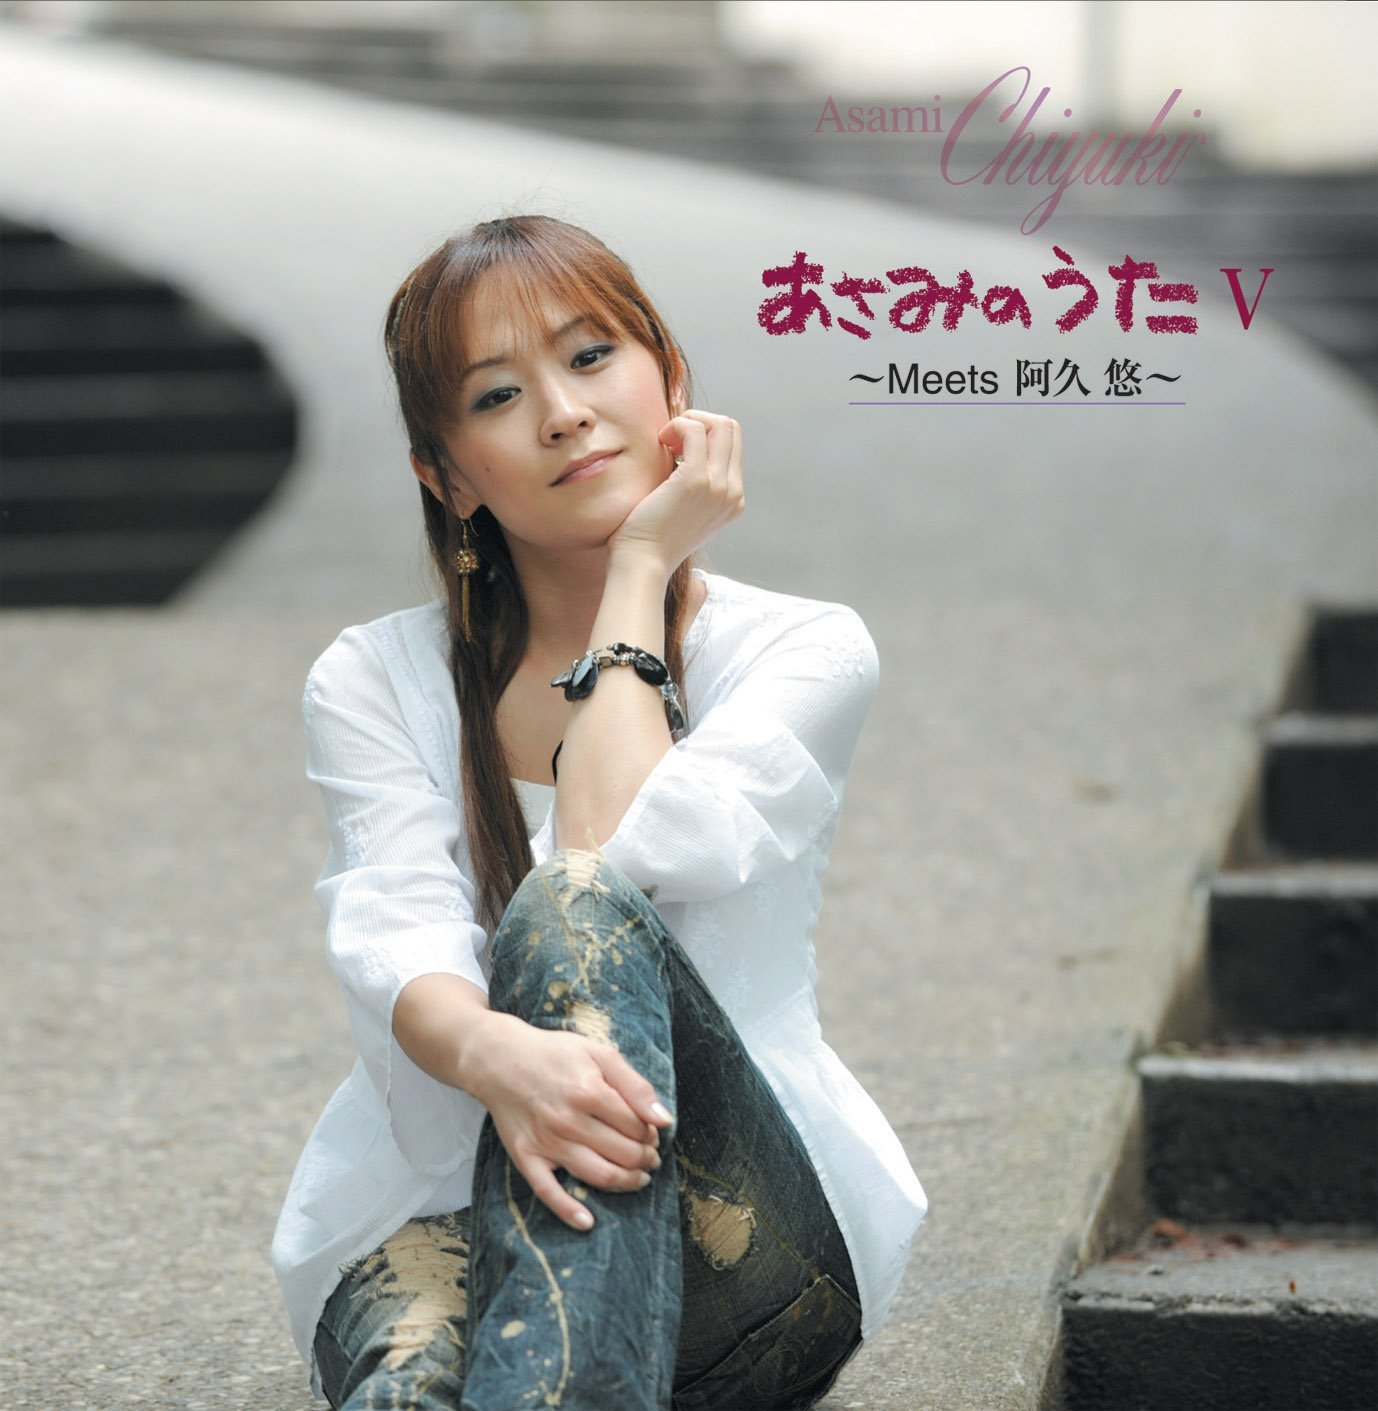 jpop80ss: asami chiyuki (あさみちゆき)